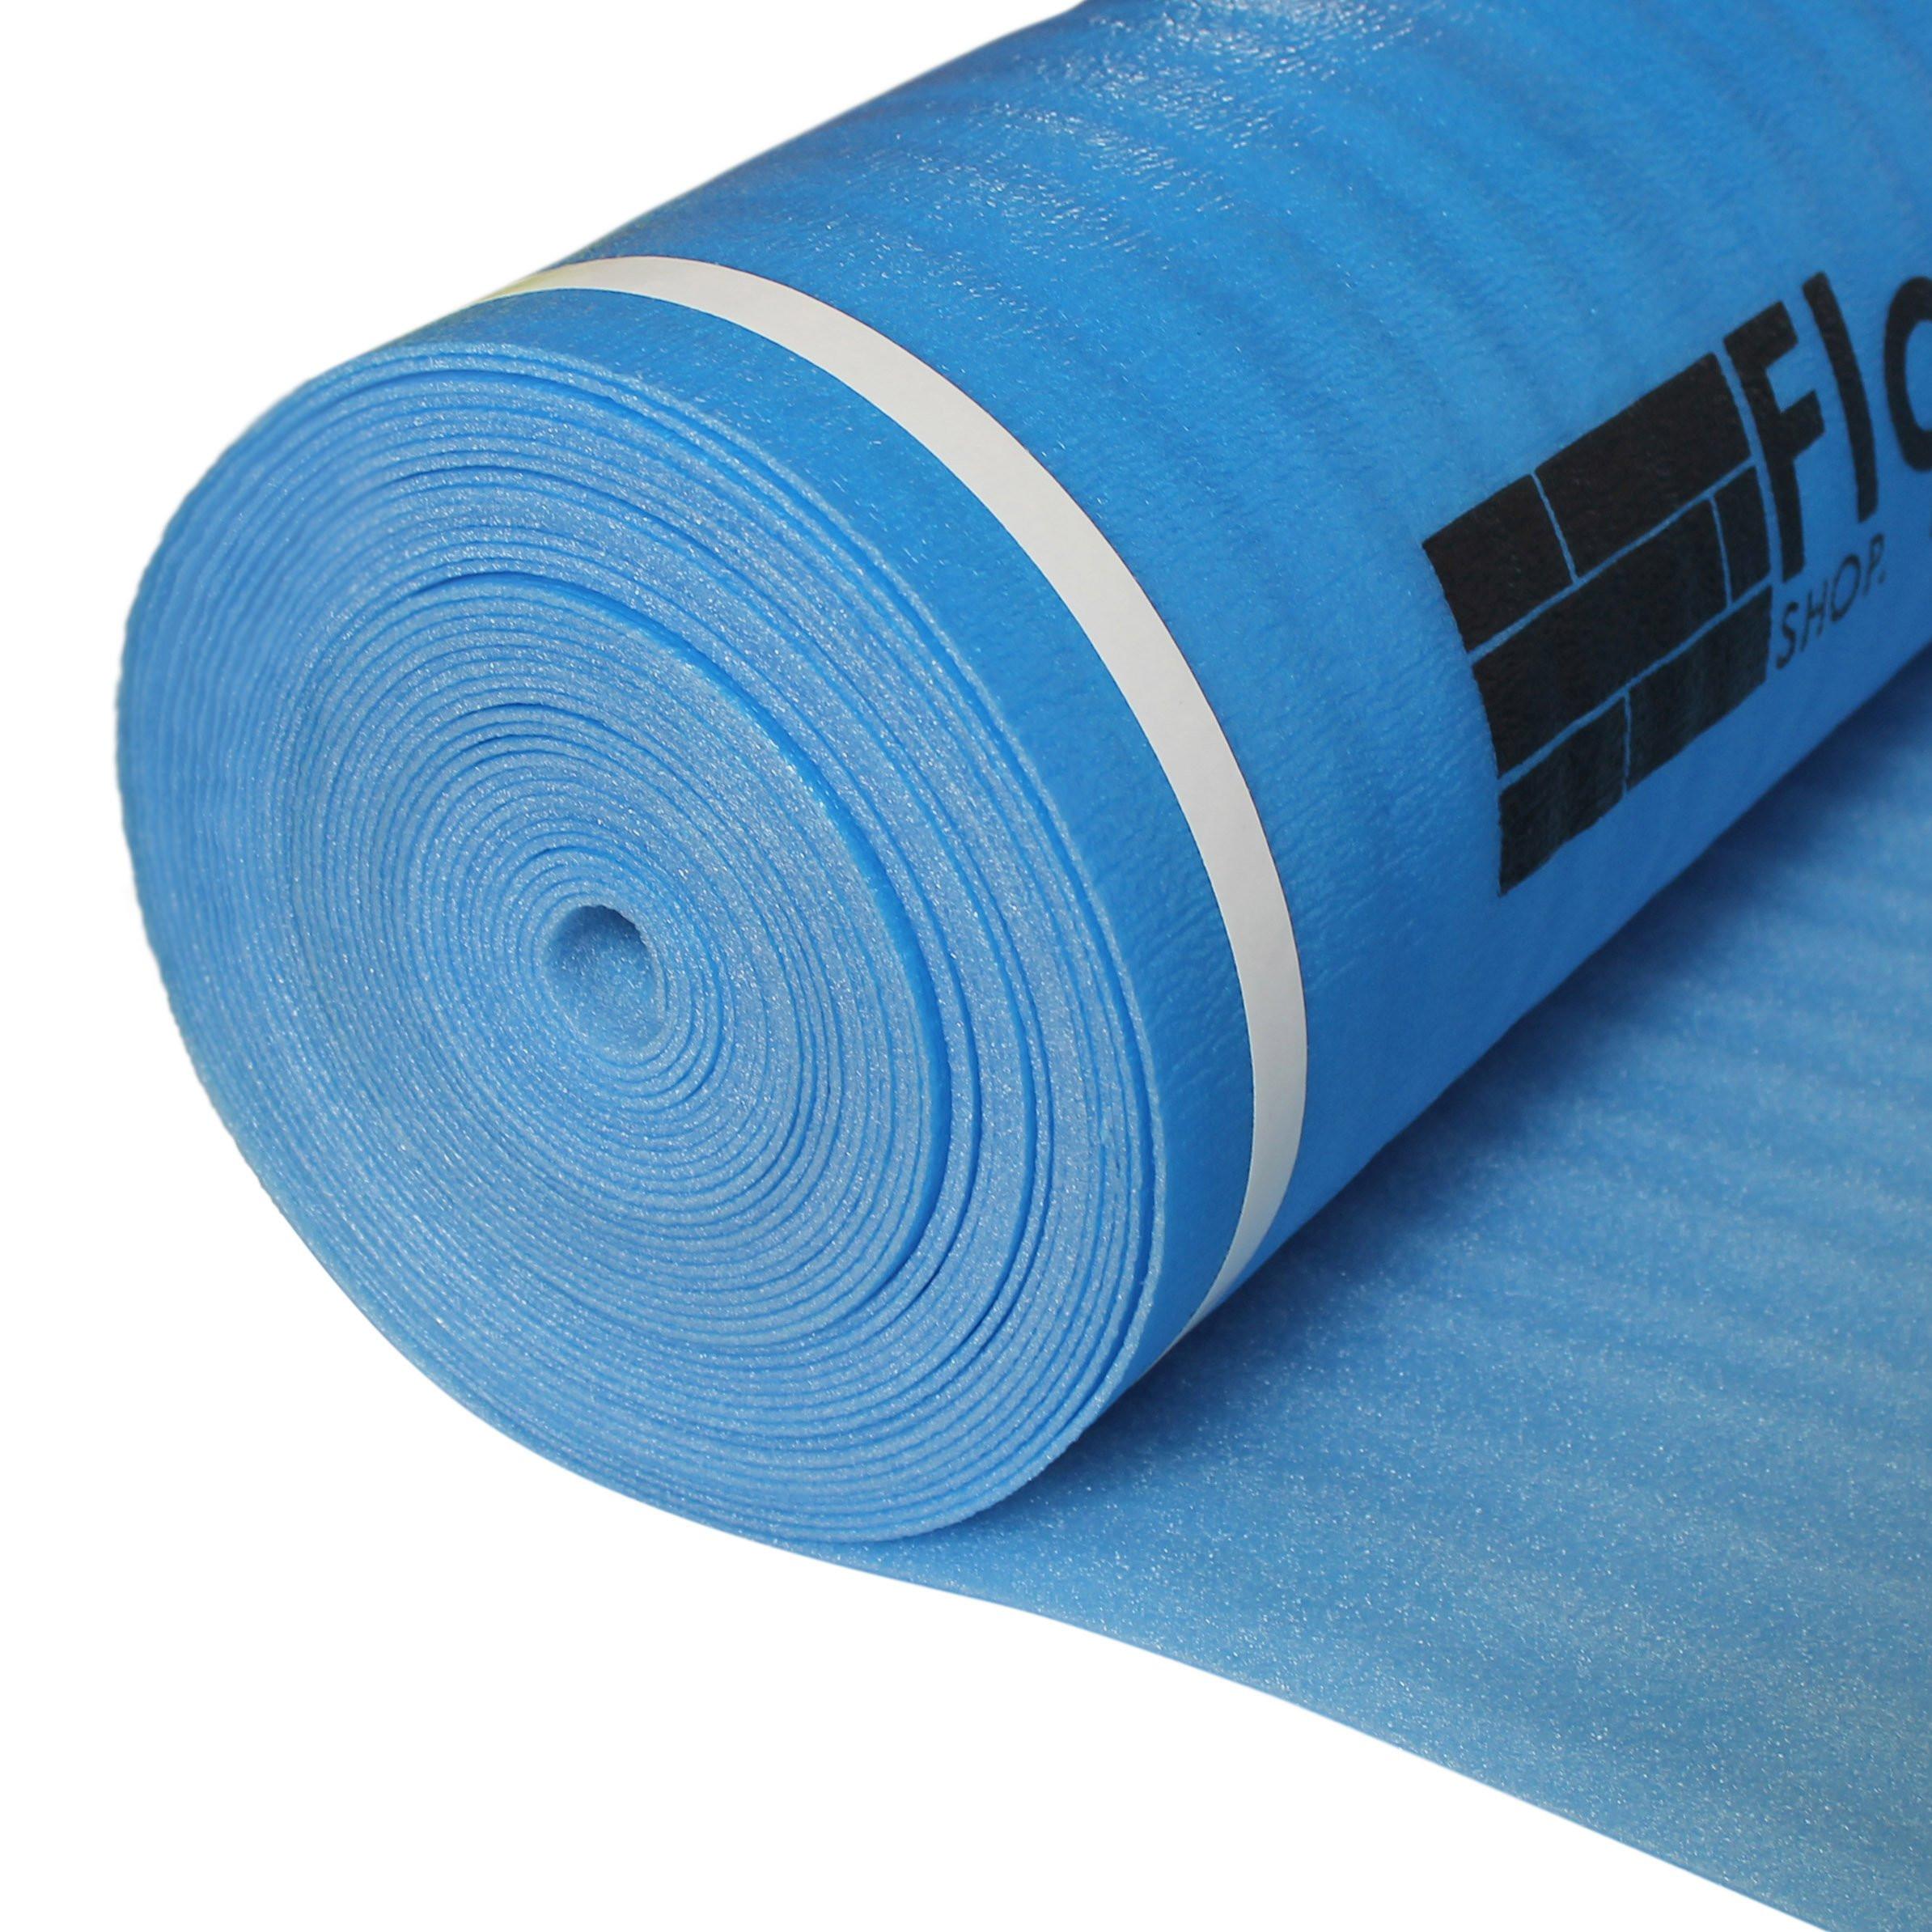 Tar Paper Underlayment Laminate Floor: 15 Recommended Asu 15 Hardwood Flooring Underlayment Felt